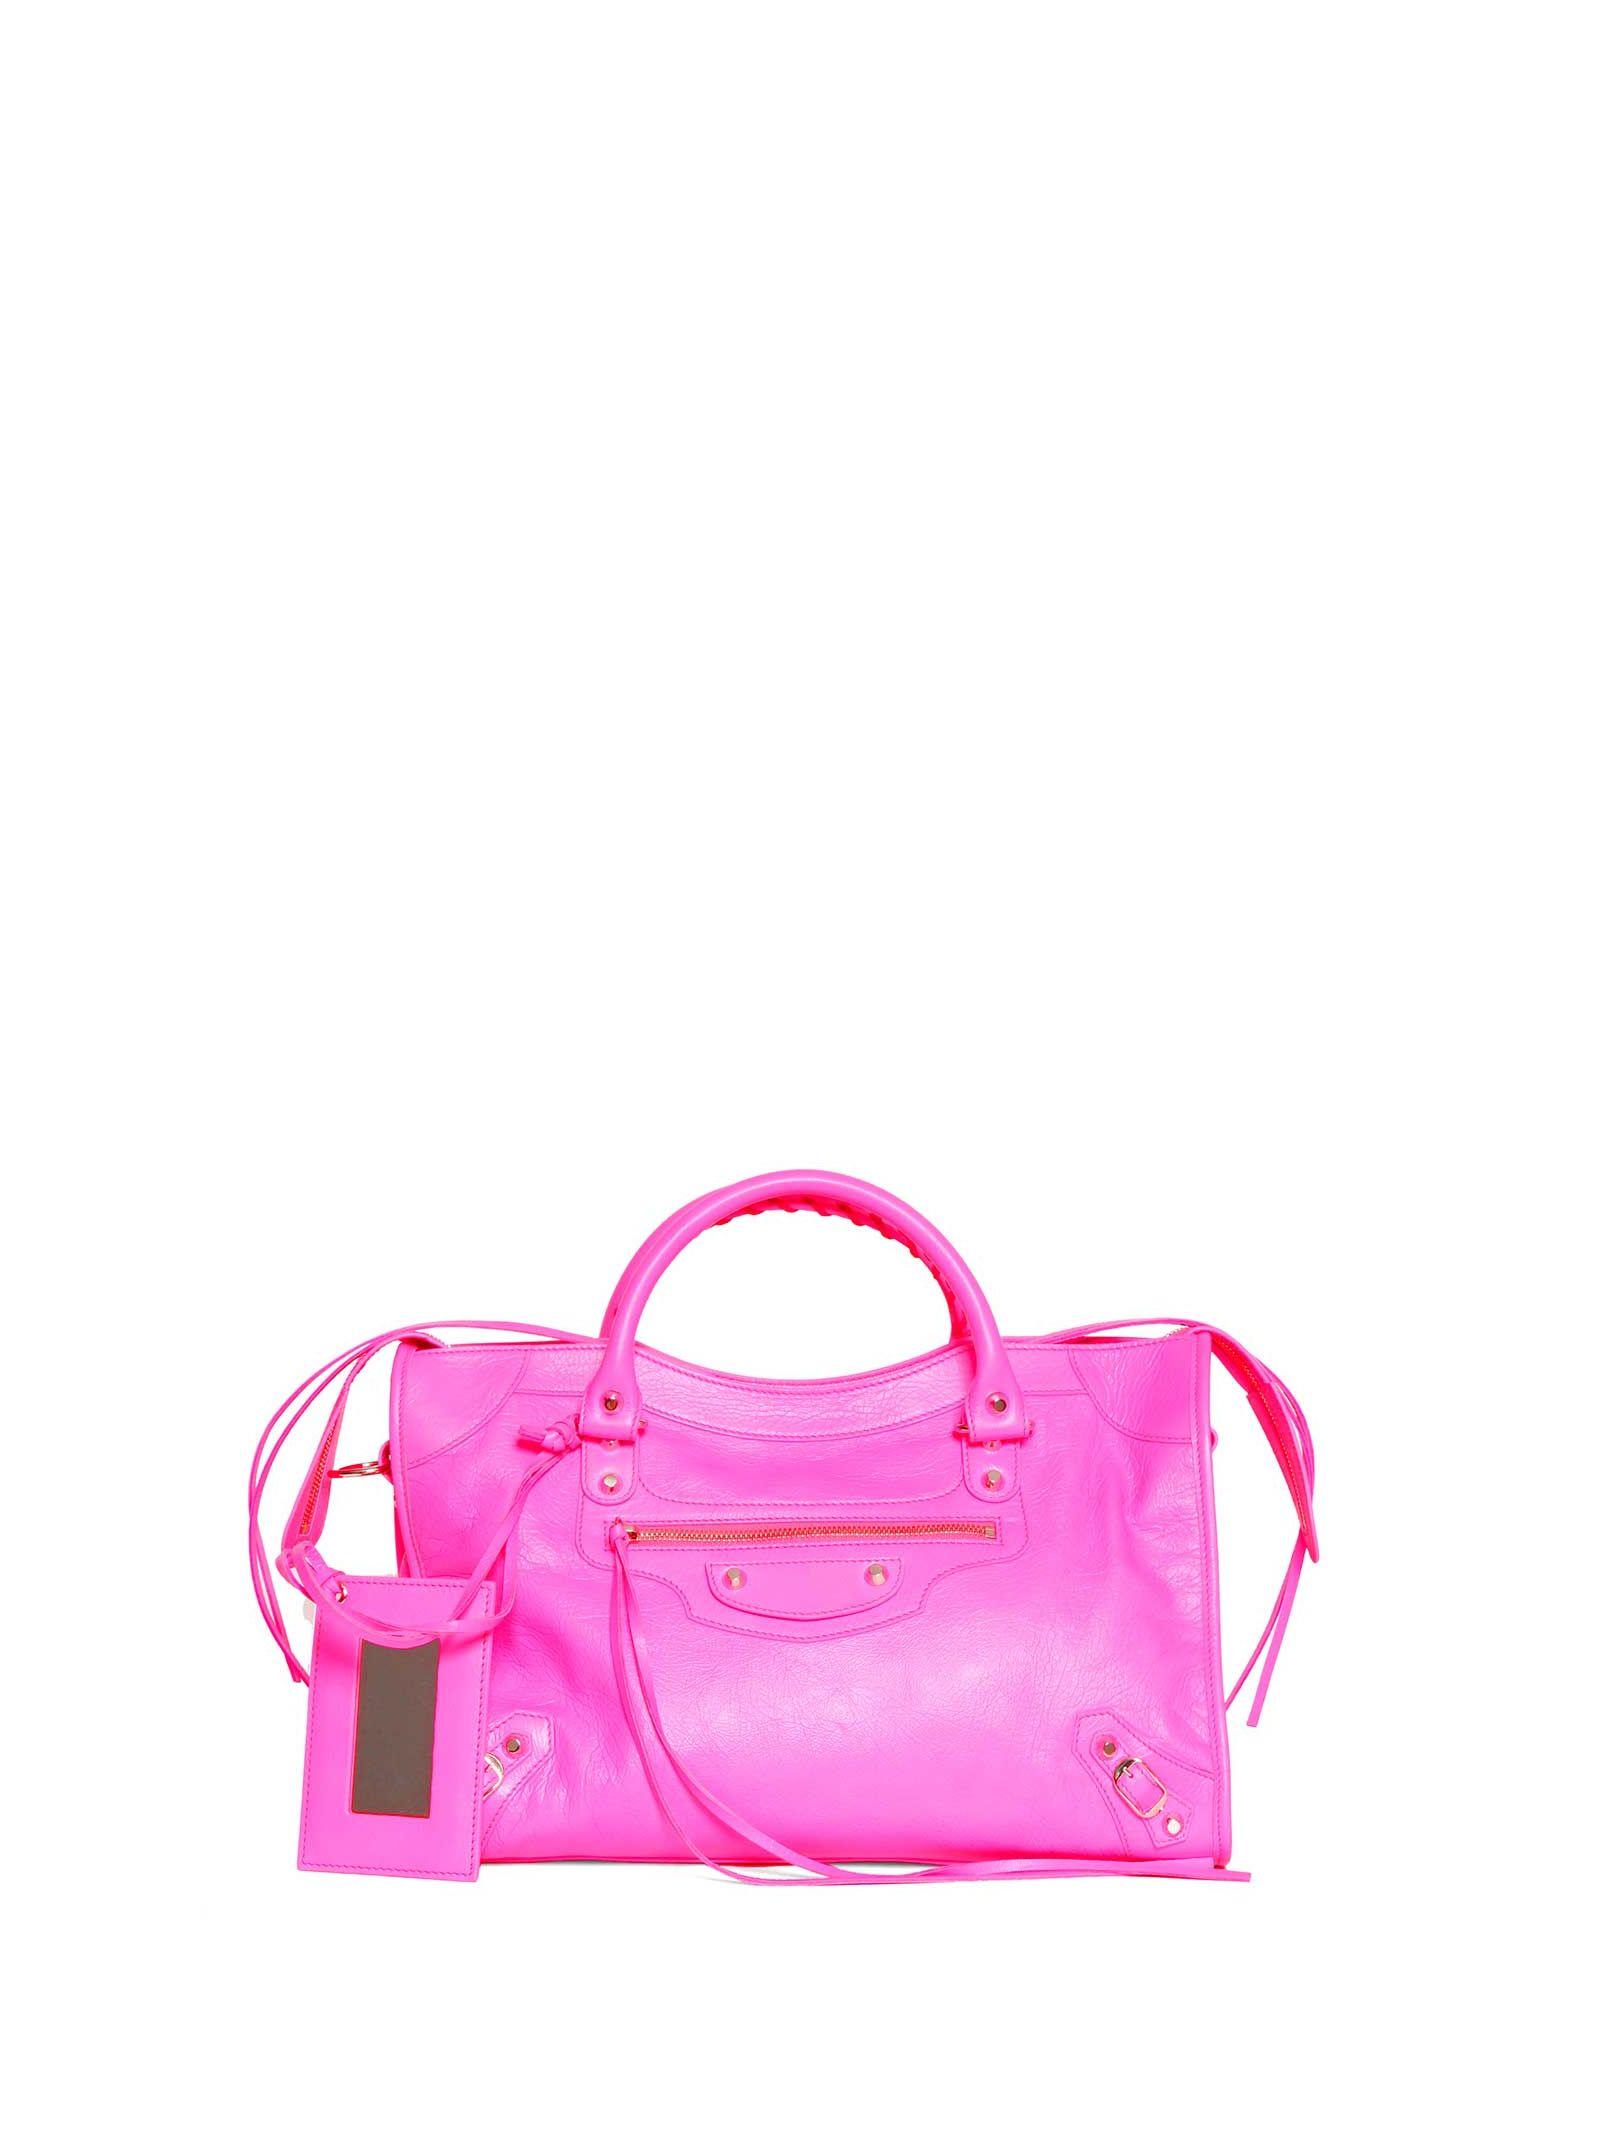 Balenciaga classic City Handbag